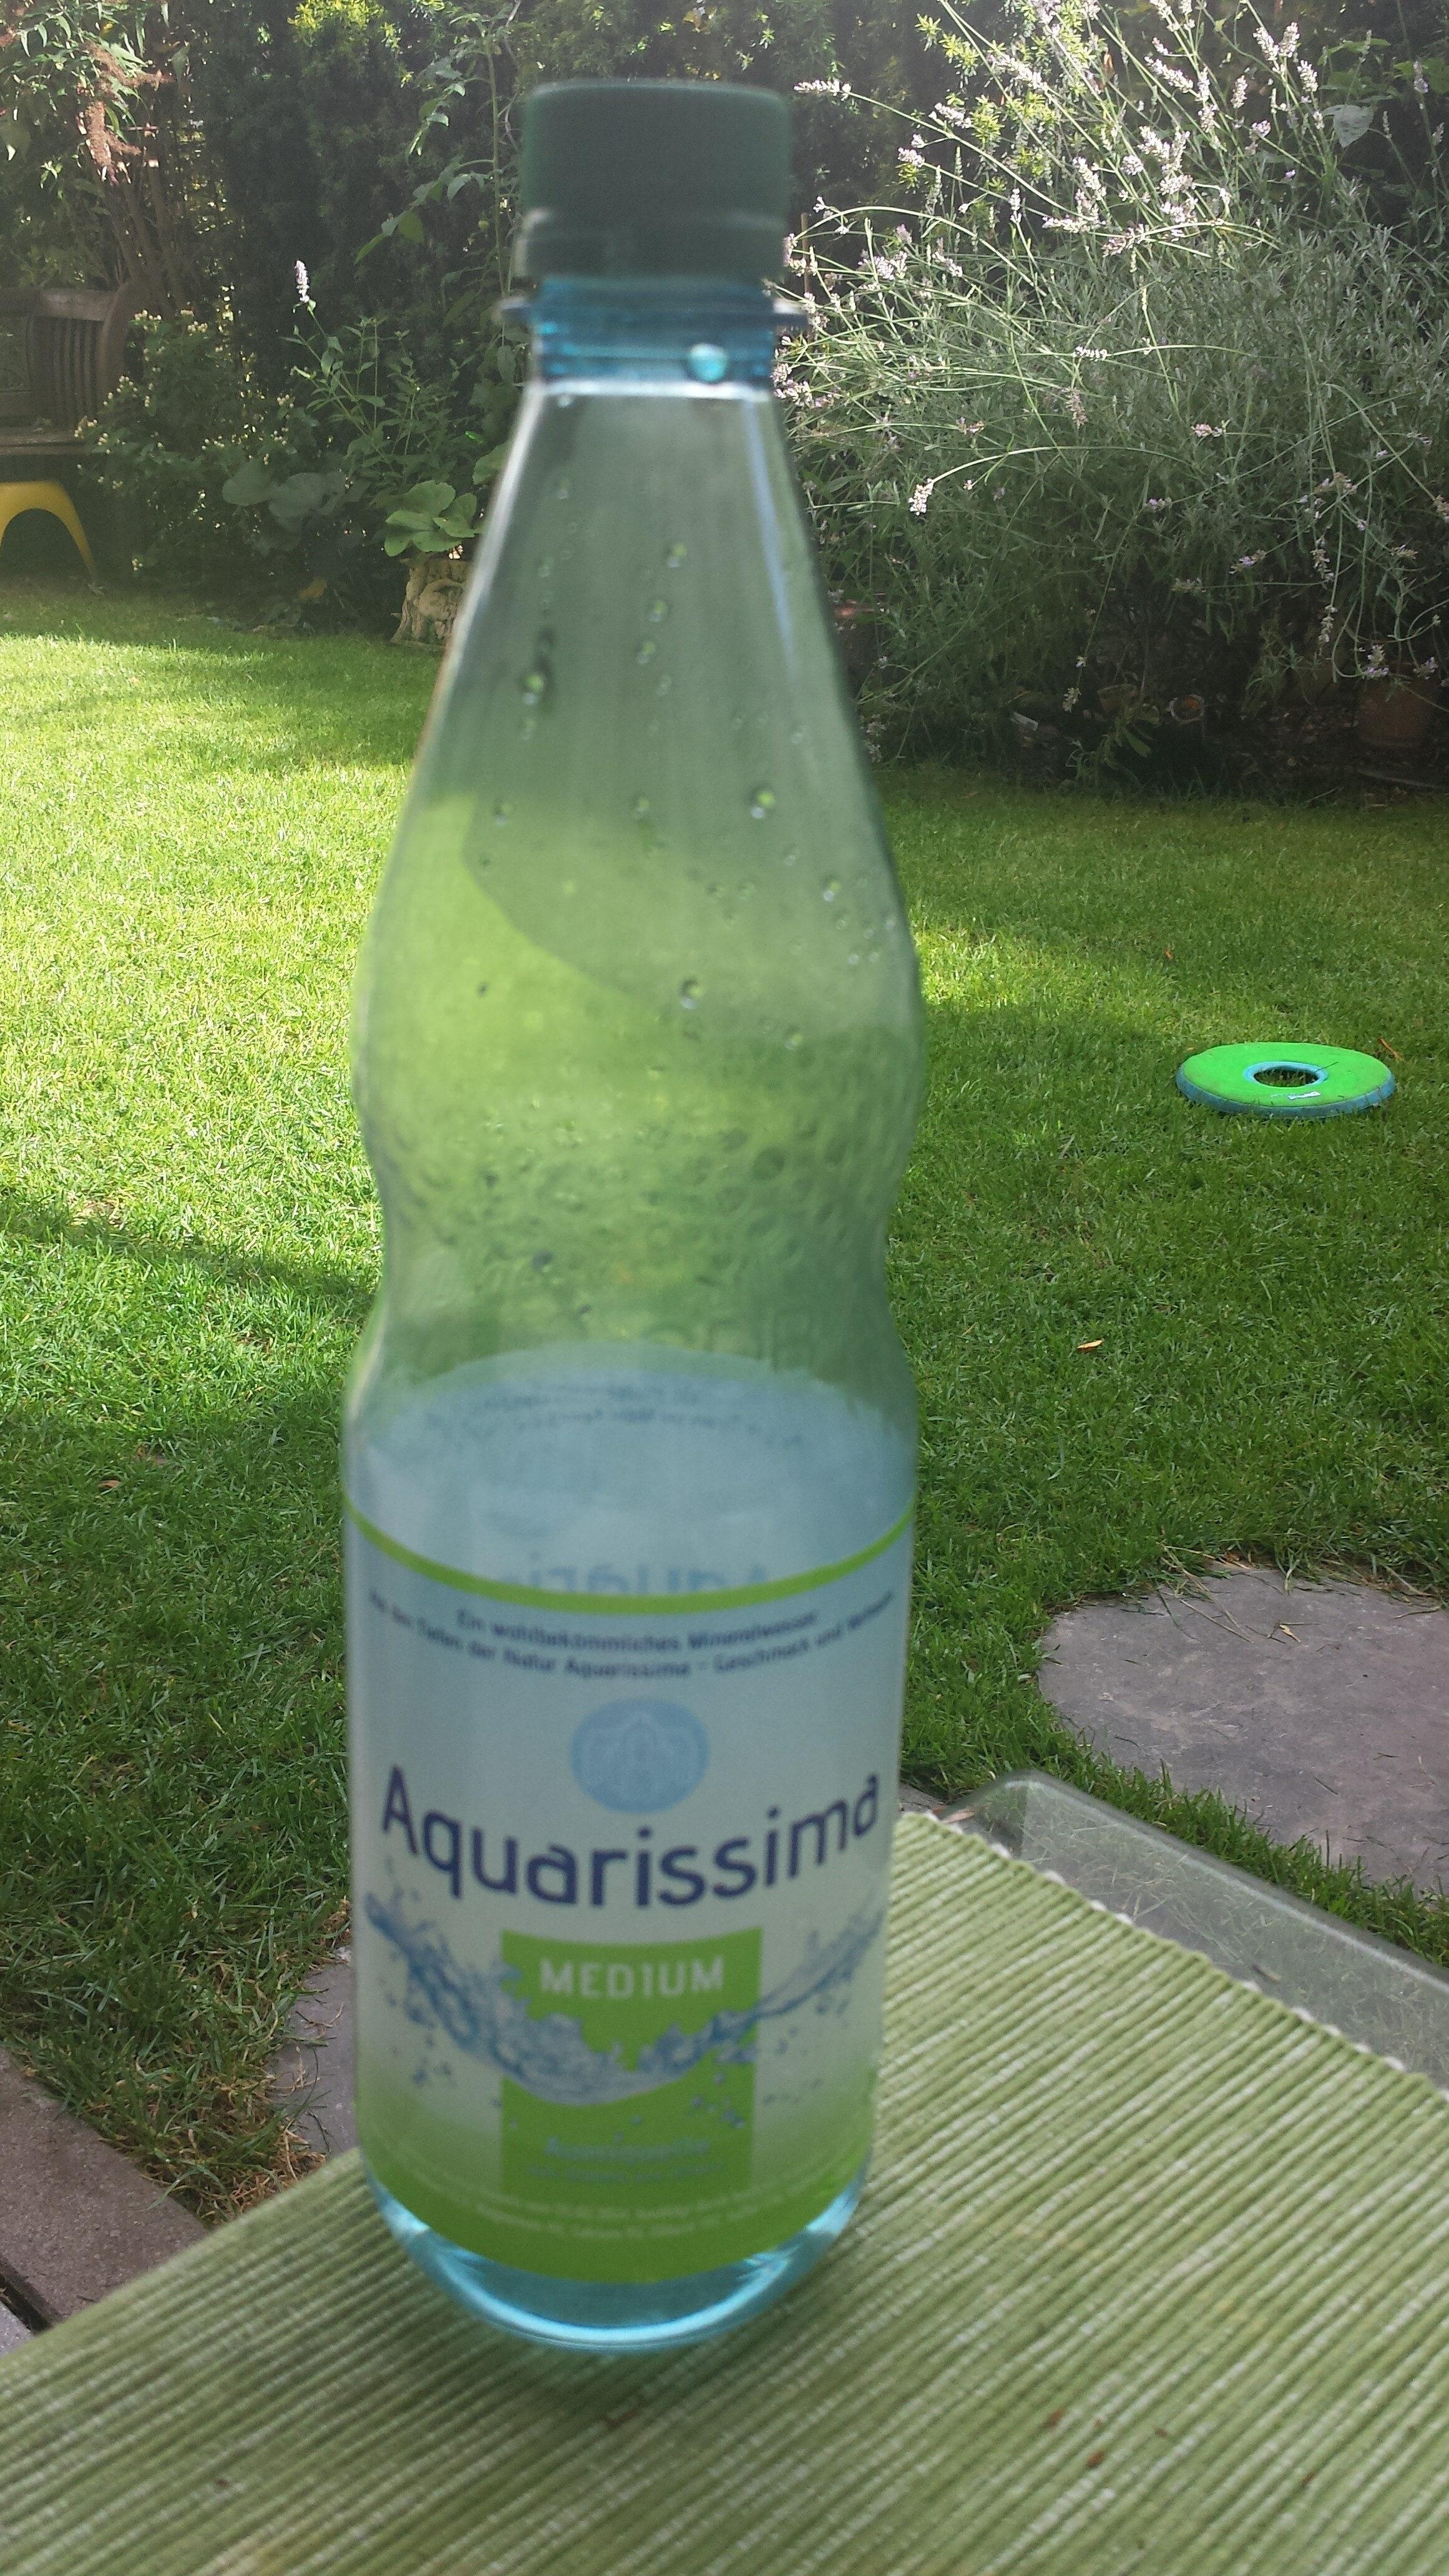 Aquarissima medium - Product - de